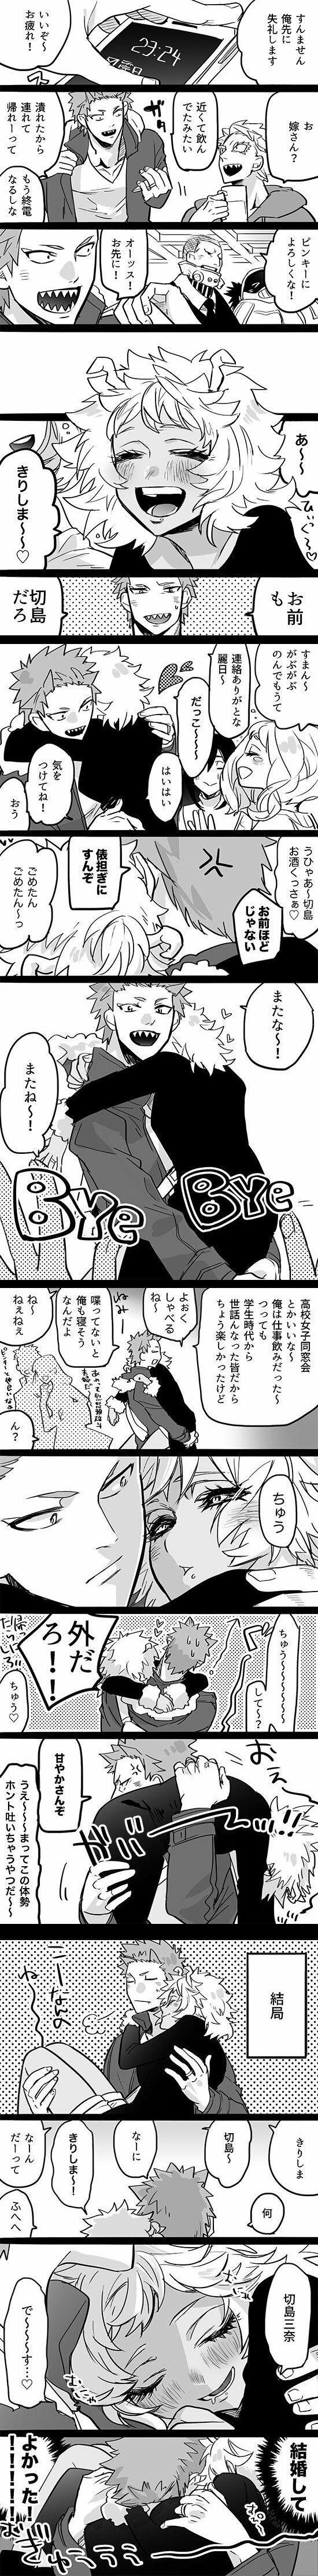 Boku no hero académia - Kirishima Eijirou x Ashido Mina  (https://twitter.com/merry__chu)